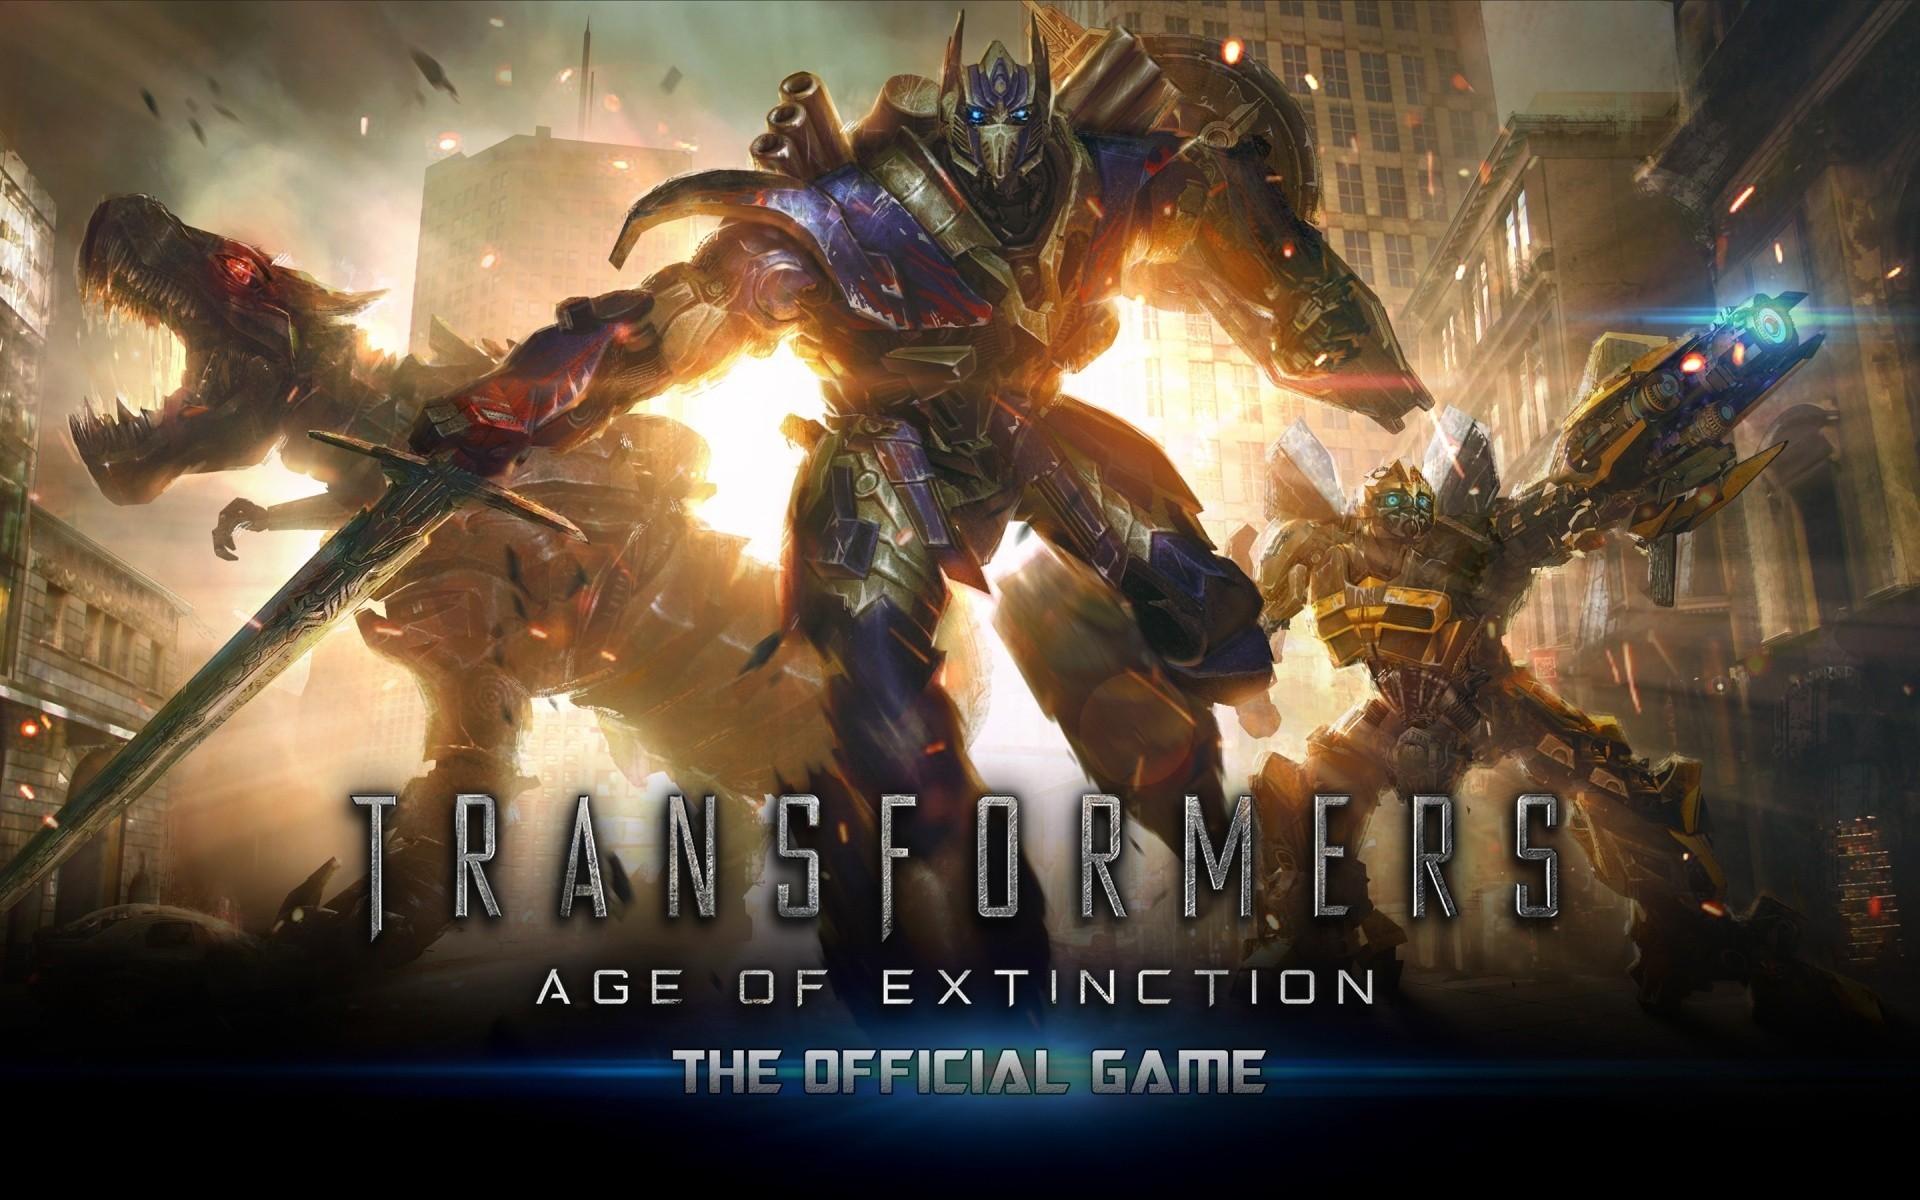 Free transformers movie online games